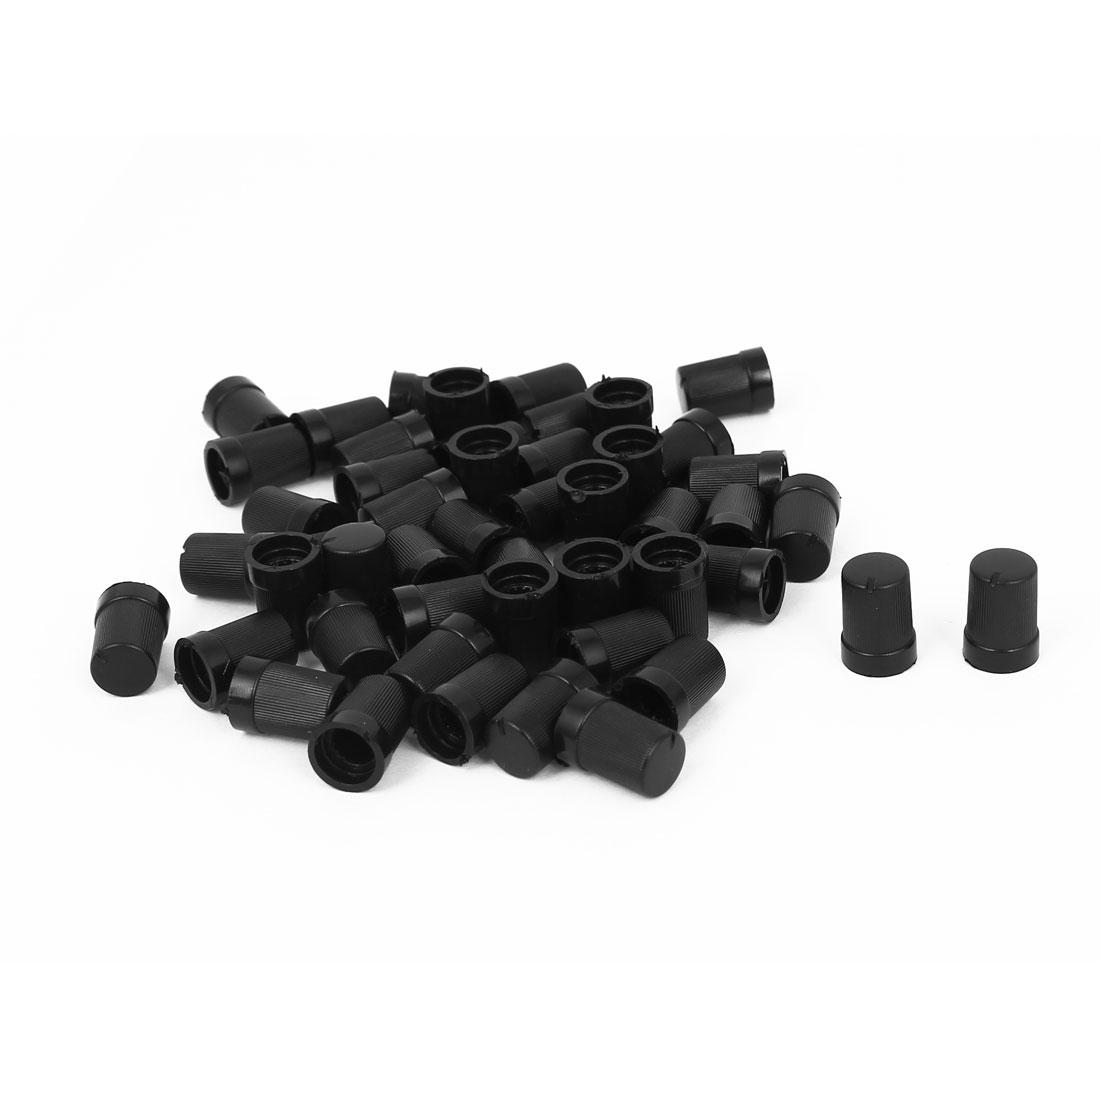 50pcs Black Round Shape Potentiometer Pot Control Knob for 7mm Dia Shaft